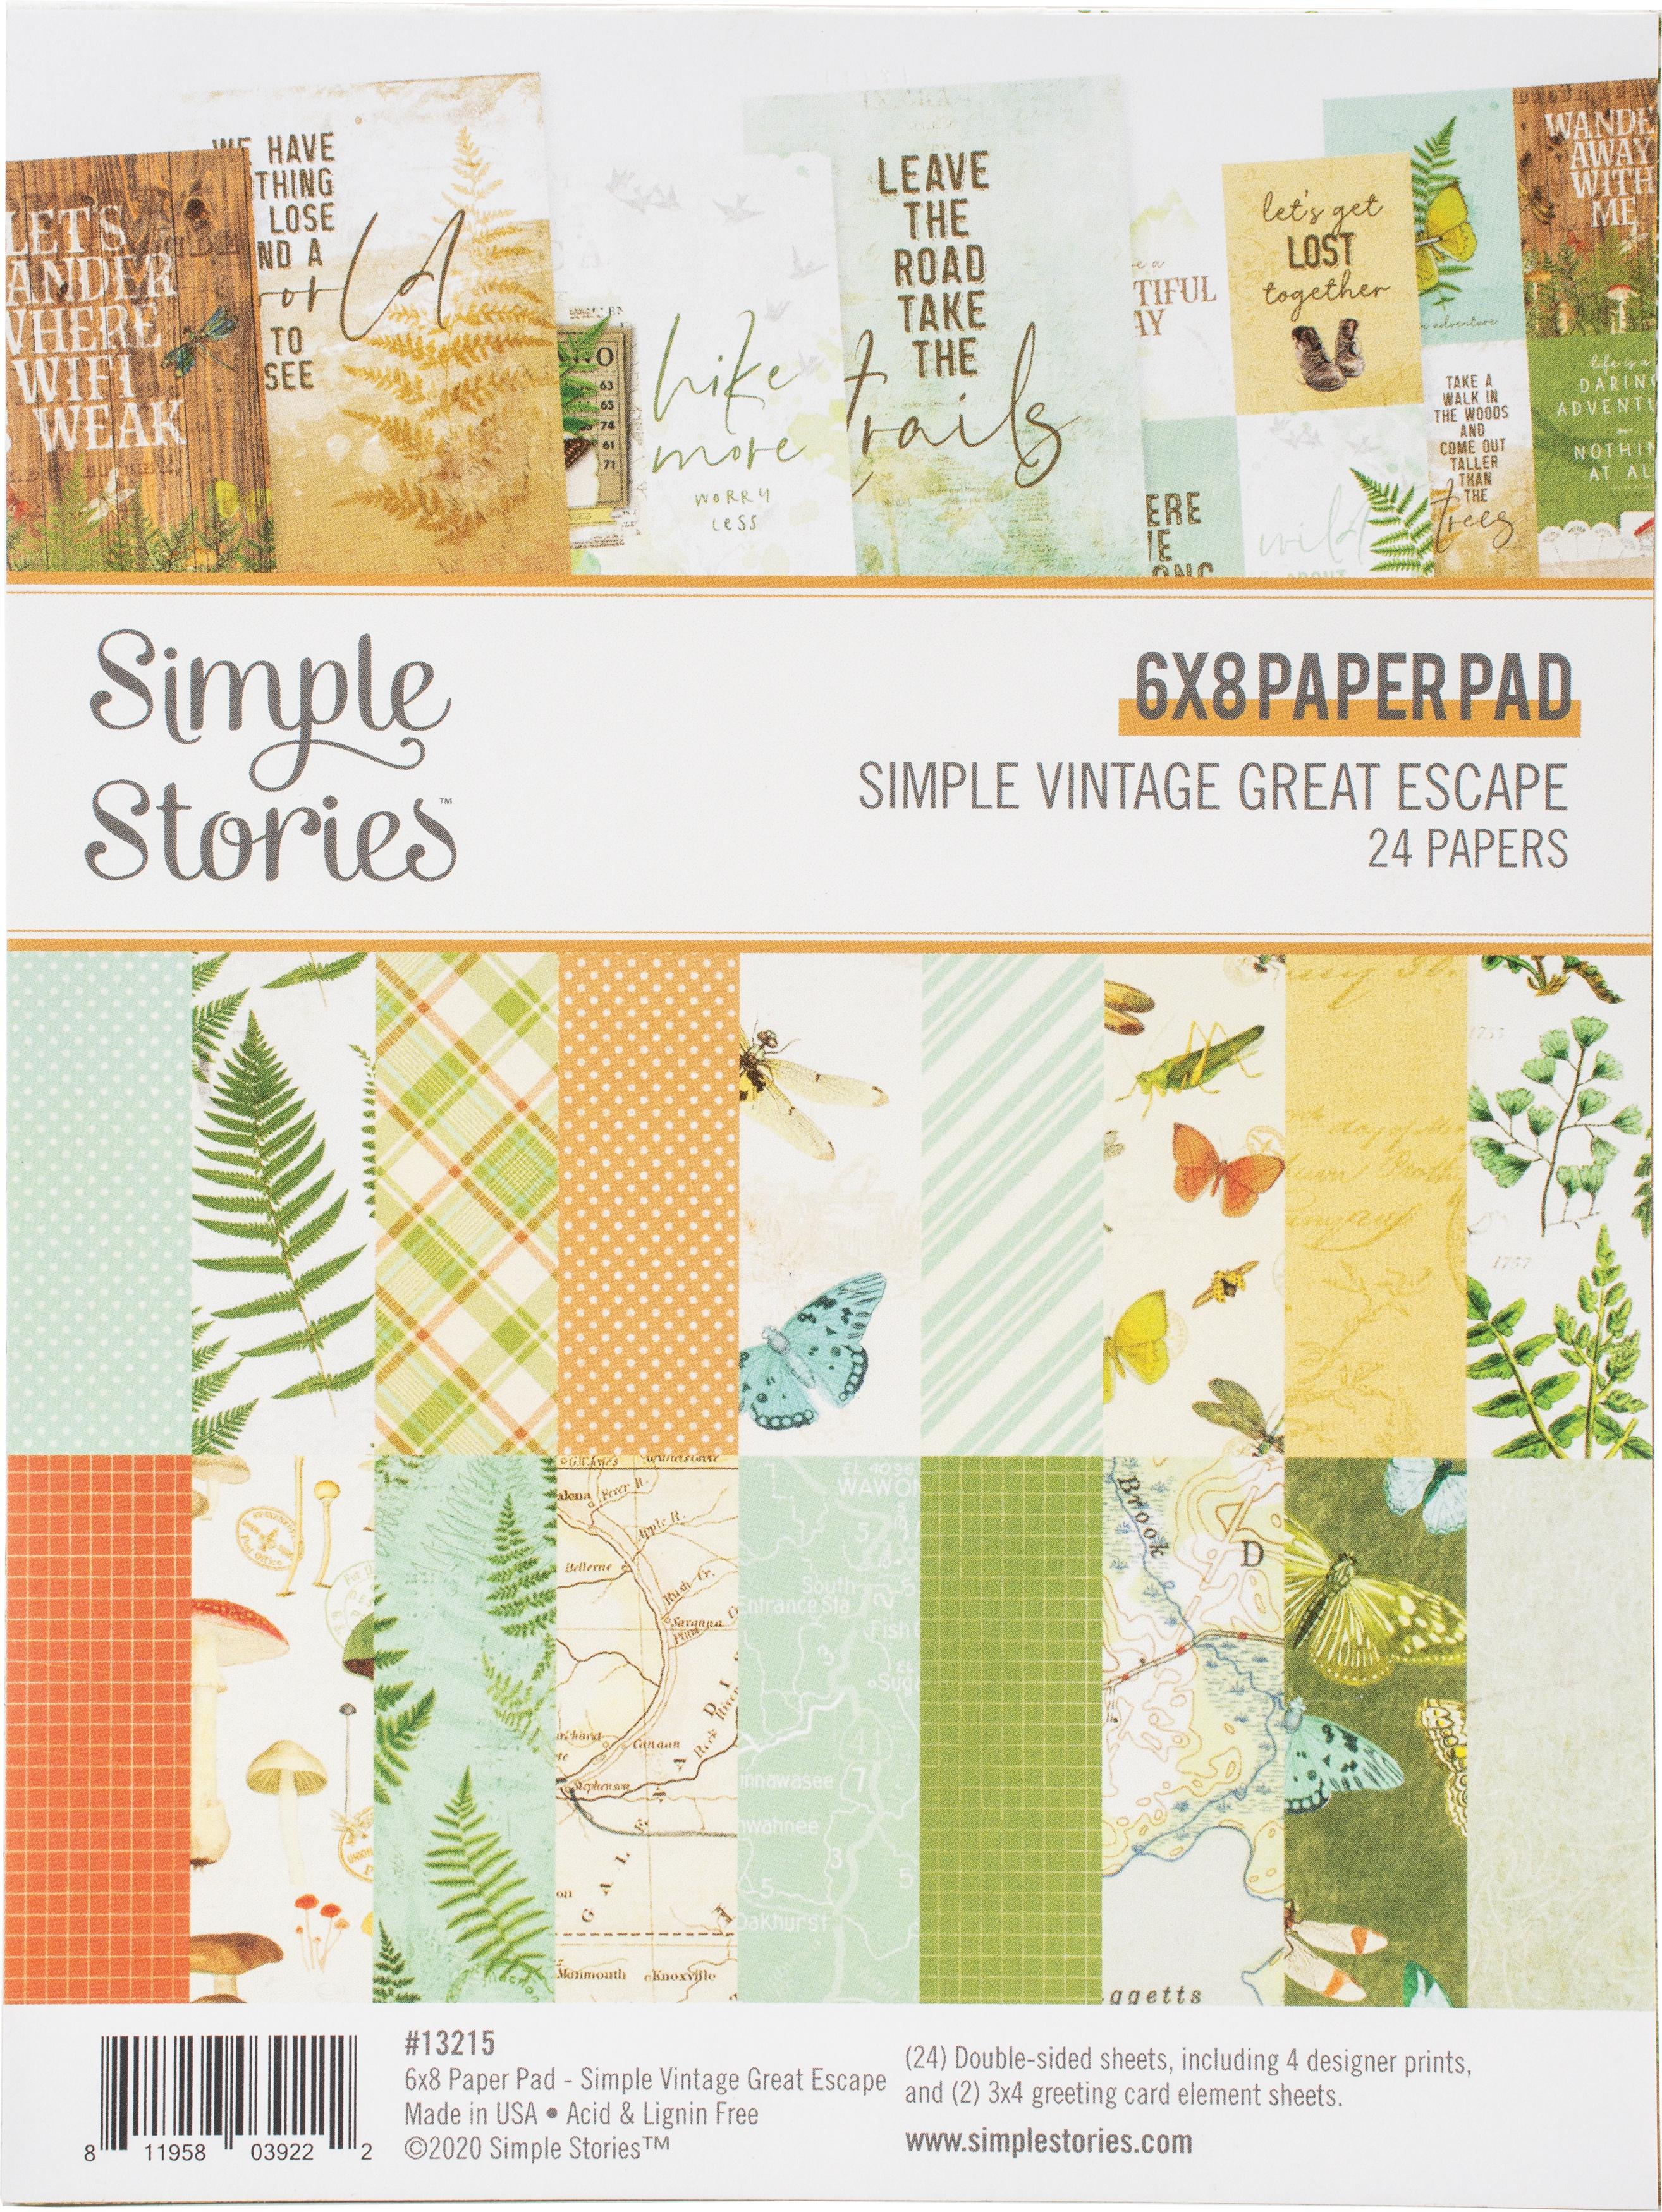 Simple Vintage Great Escape 6x8 pad